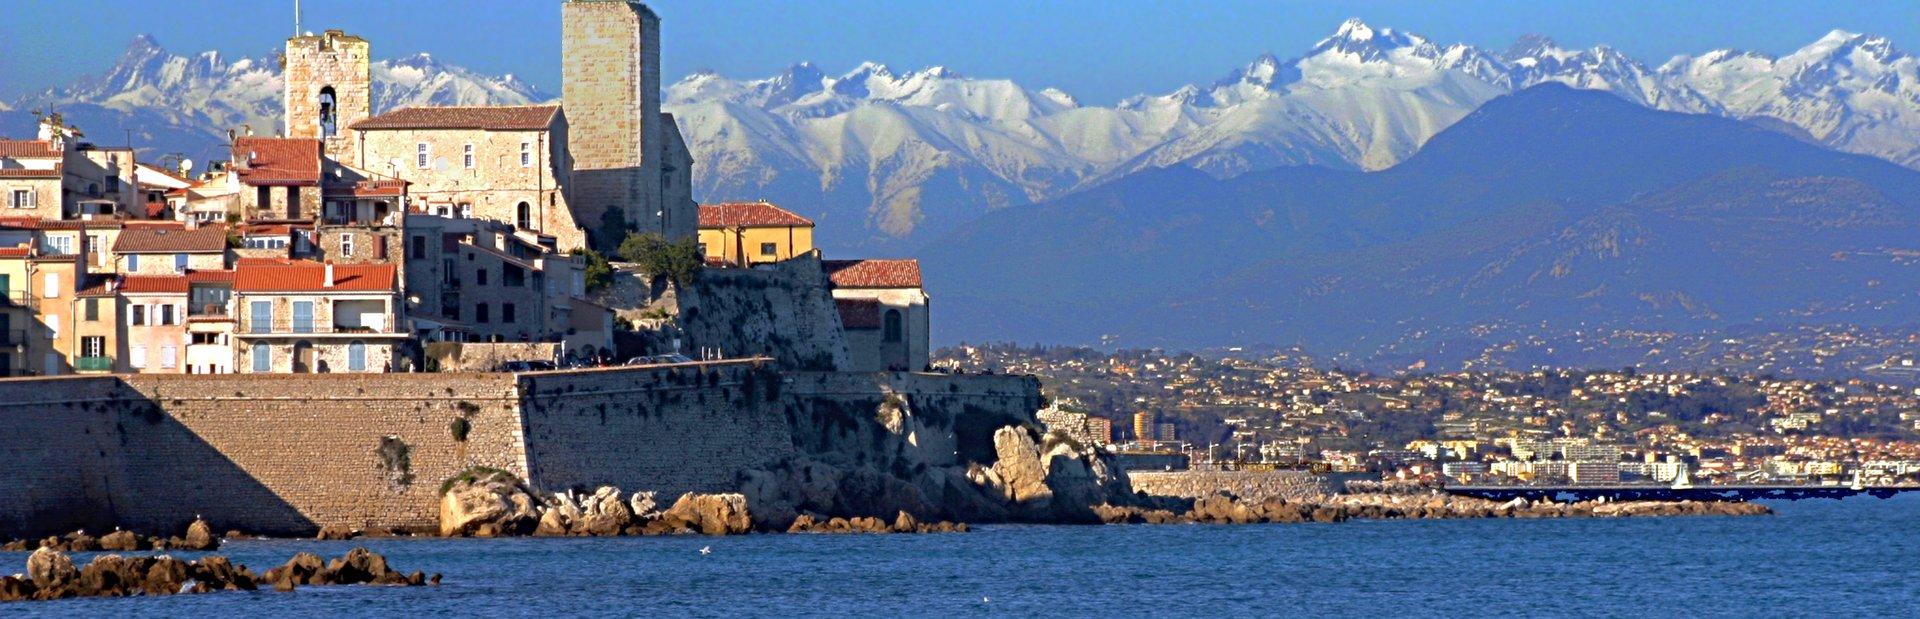 A bay of impressive natural beauty